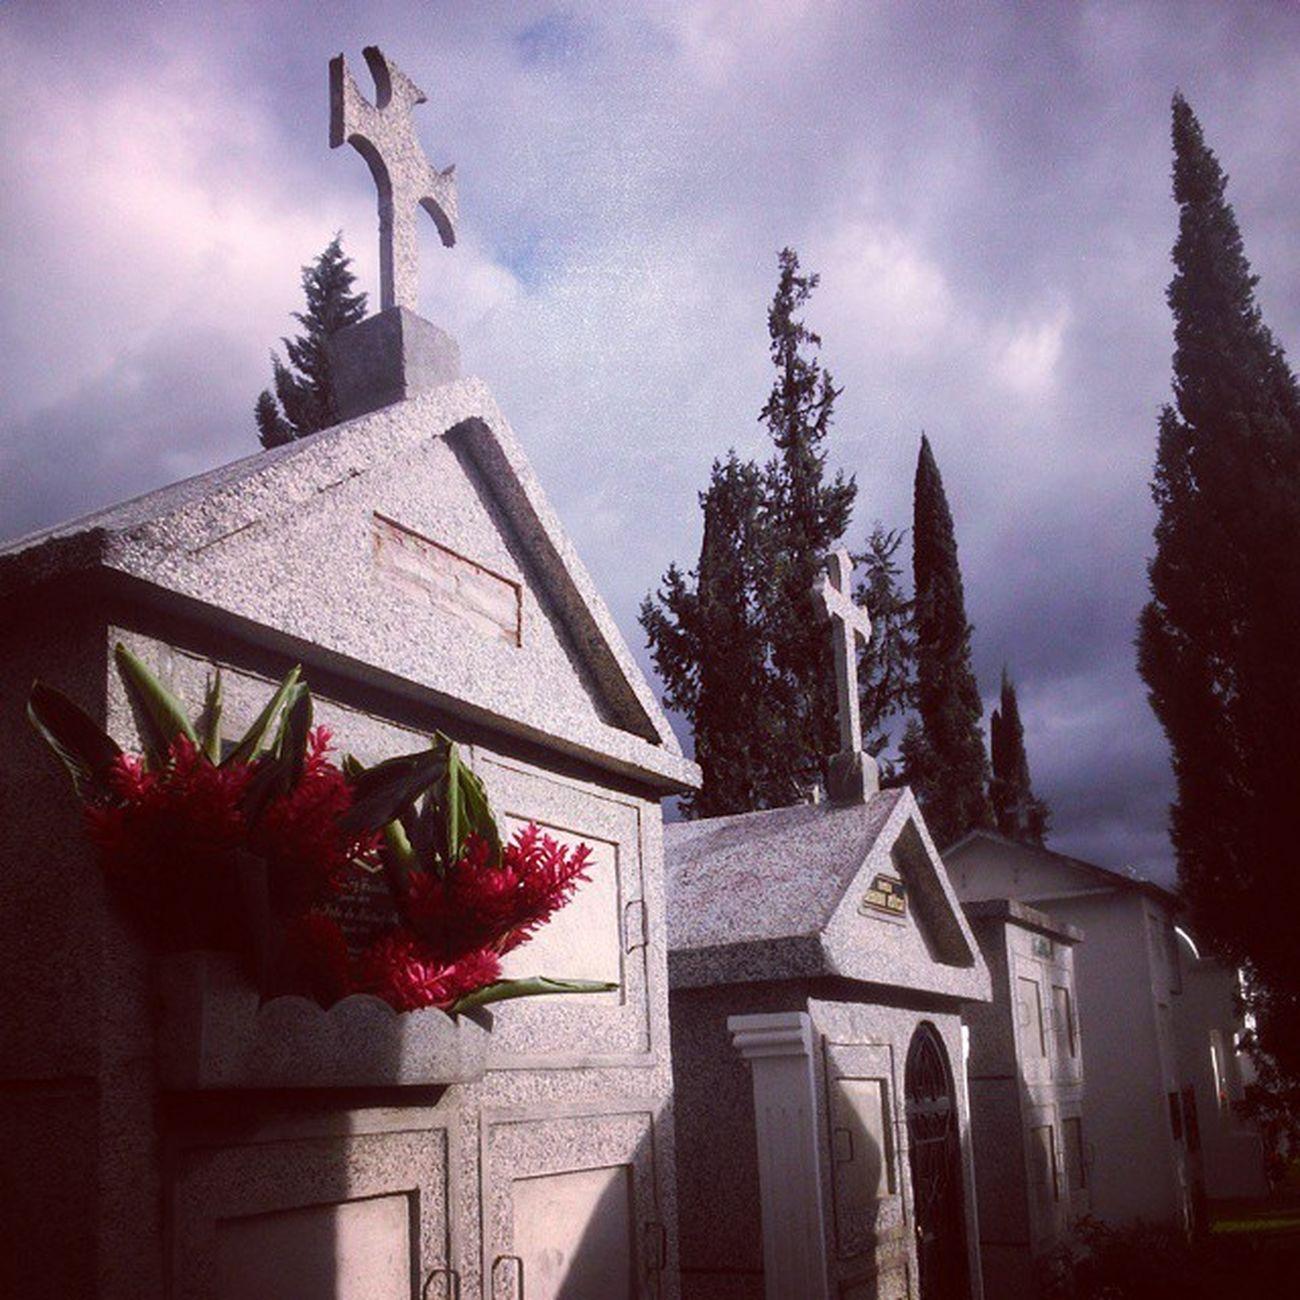 Vida y muerte / Life and death Cementerio privado San Lázaro, Antigua Guatemala. Antigua Guatemala Noviembre Tradiciones Colores Vida Muerte Guategram Instaguate PerhapsYouNeedALittleGuatemala TheRealGuatemala VSCO Vscocam November Life Death